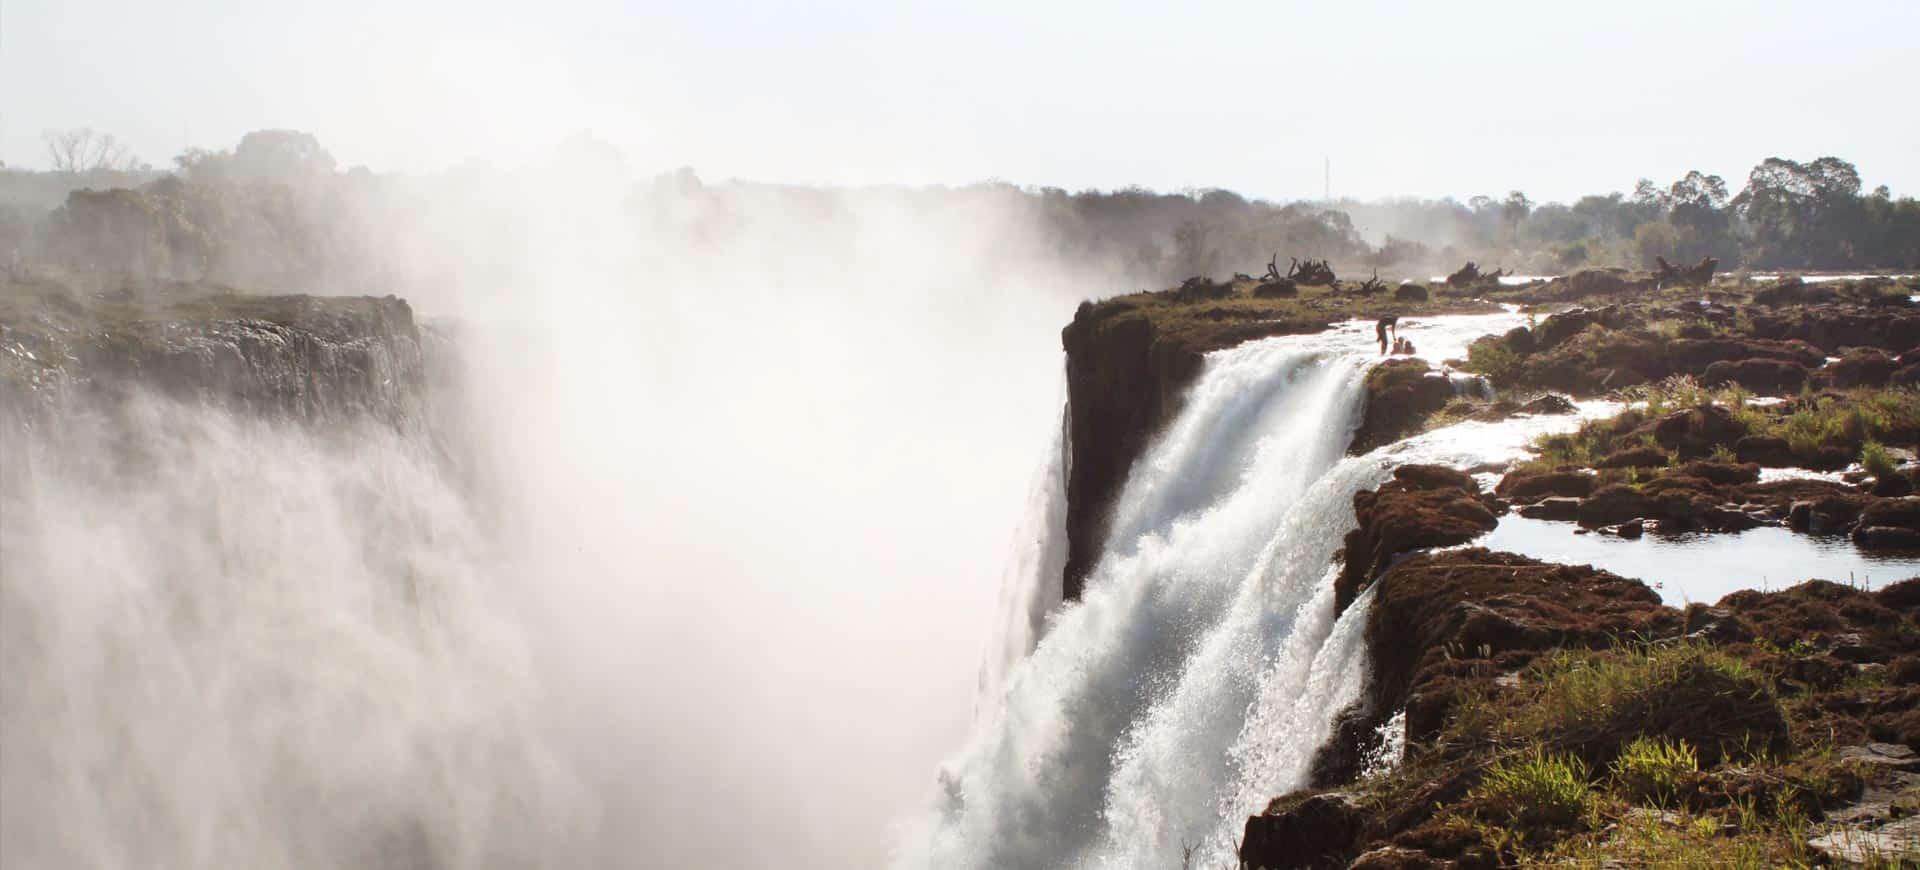 Devils Pool in Victoria Falls